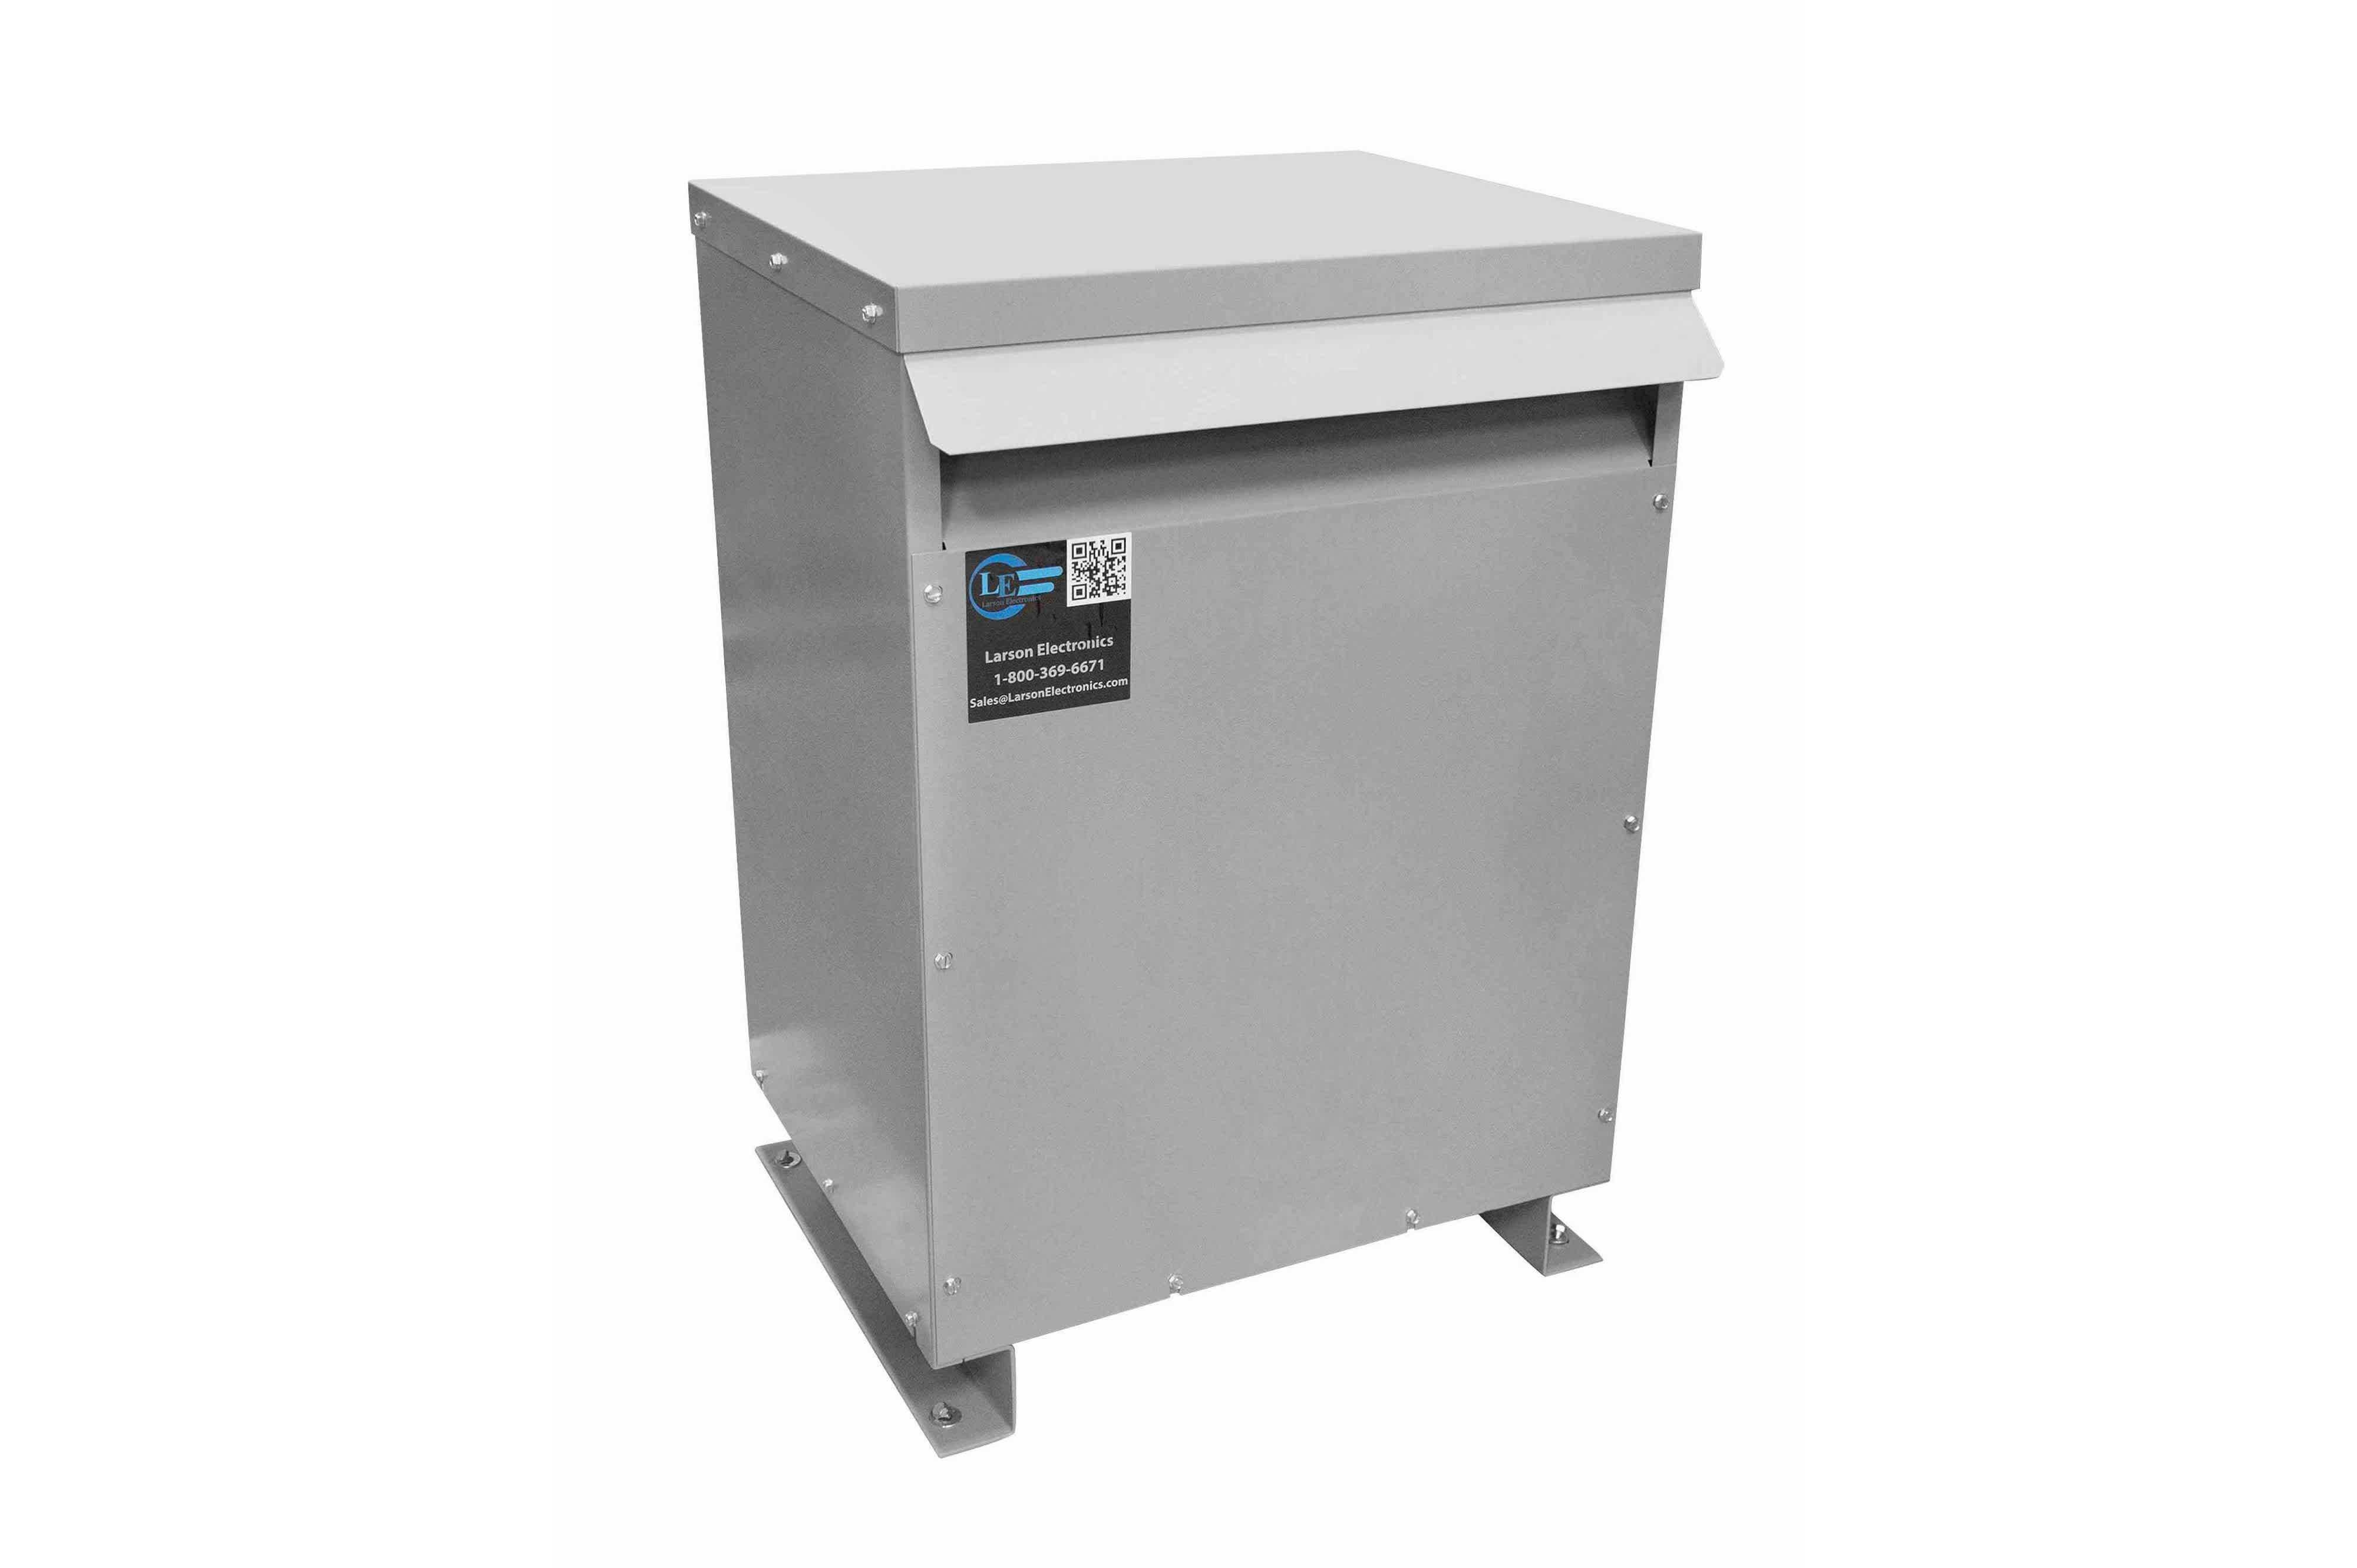 150 kVA 3PH DOE Transformer, 600V Delta Primary, 208Y/120 Wye-N Secondary, N3R, Ventilated, 60 Hz